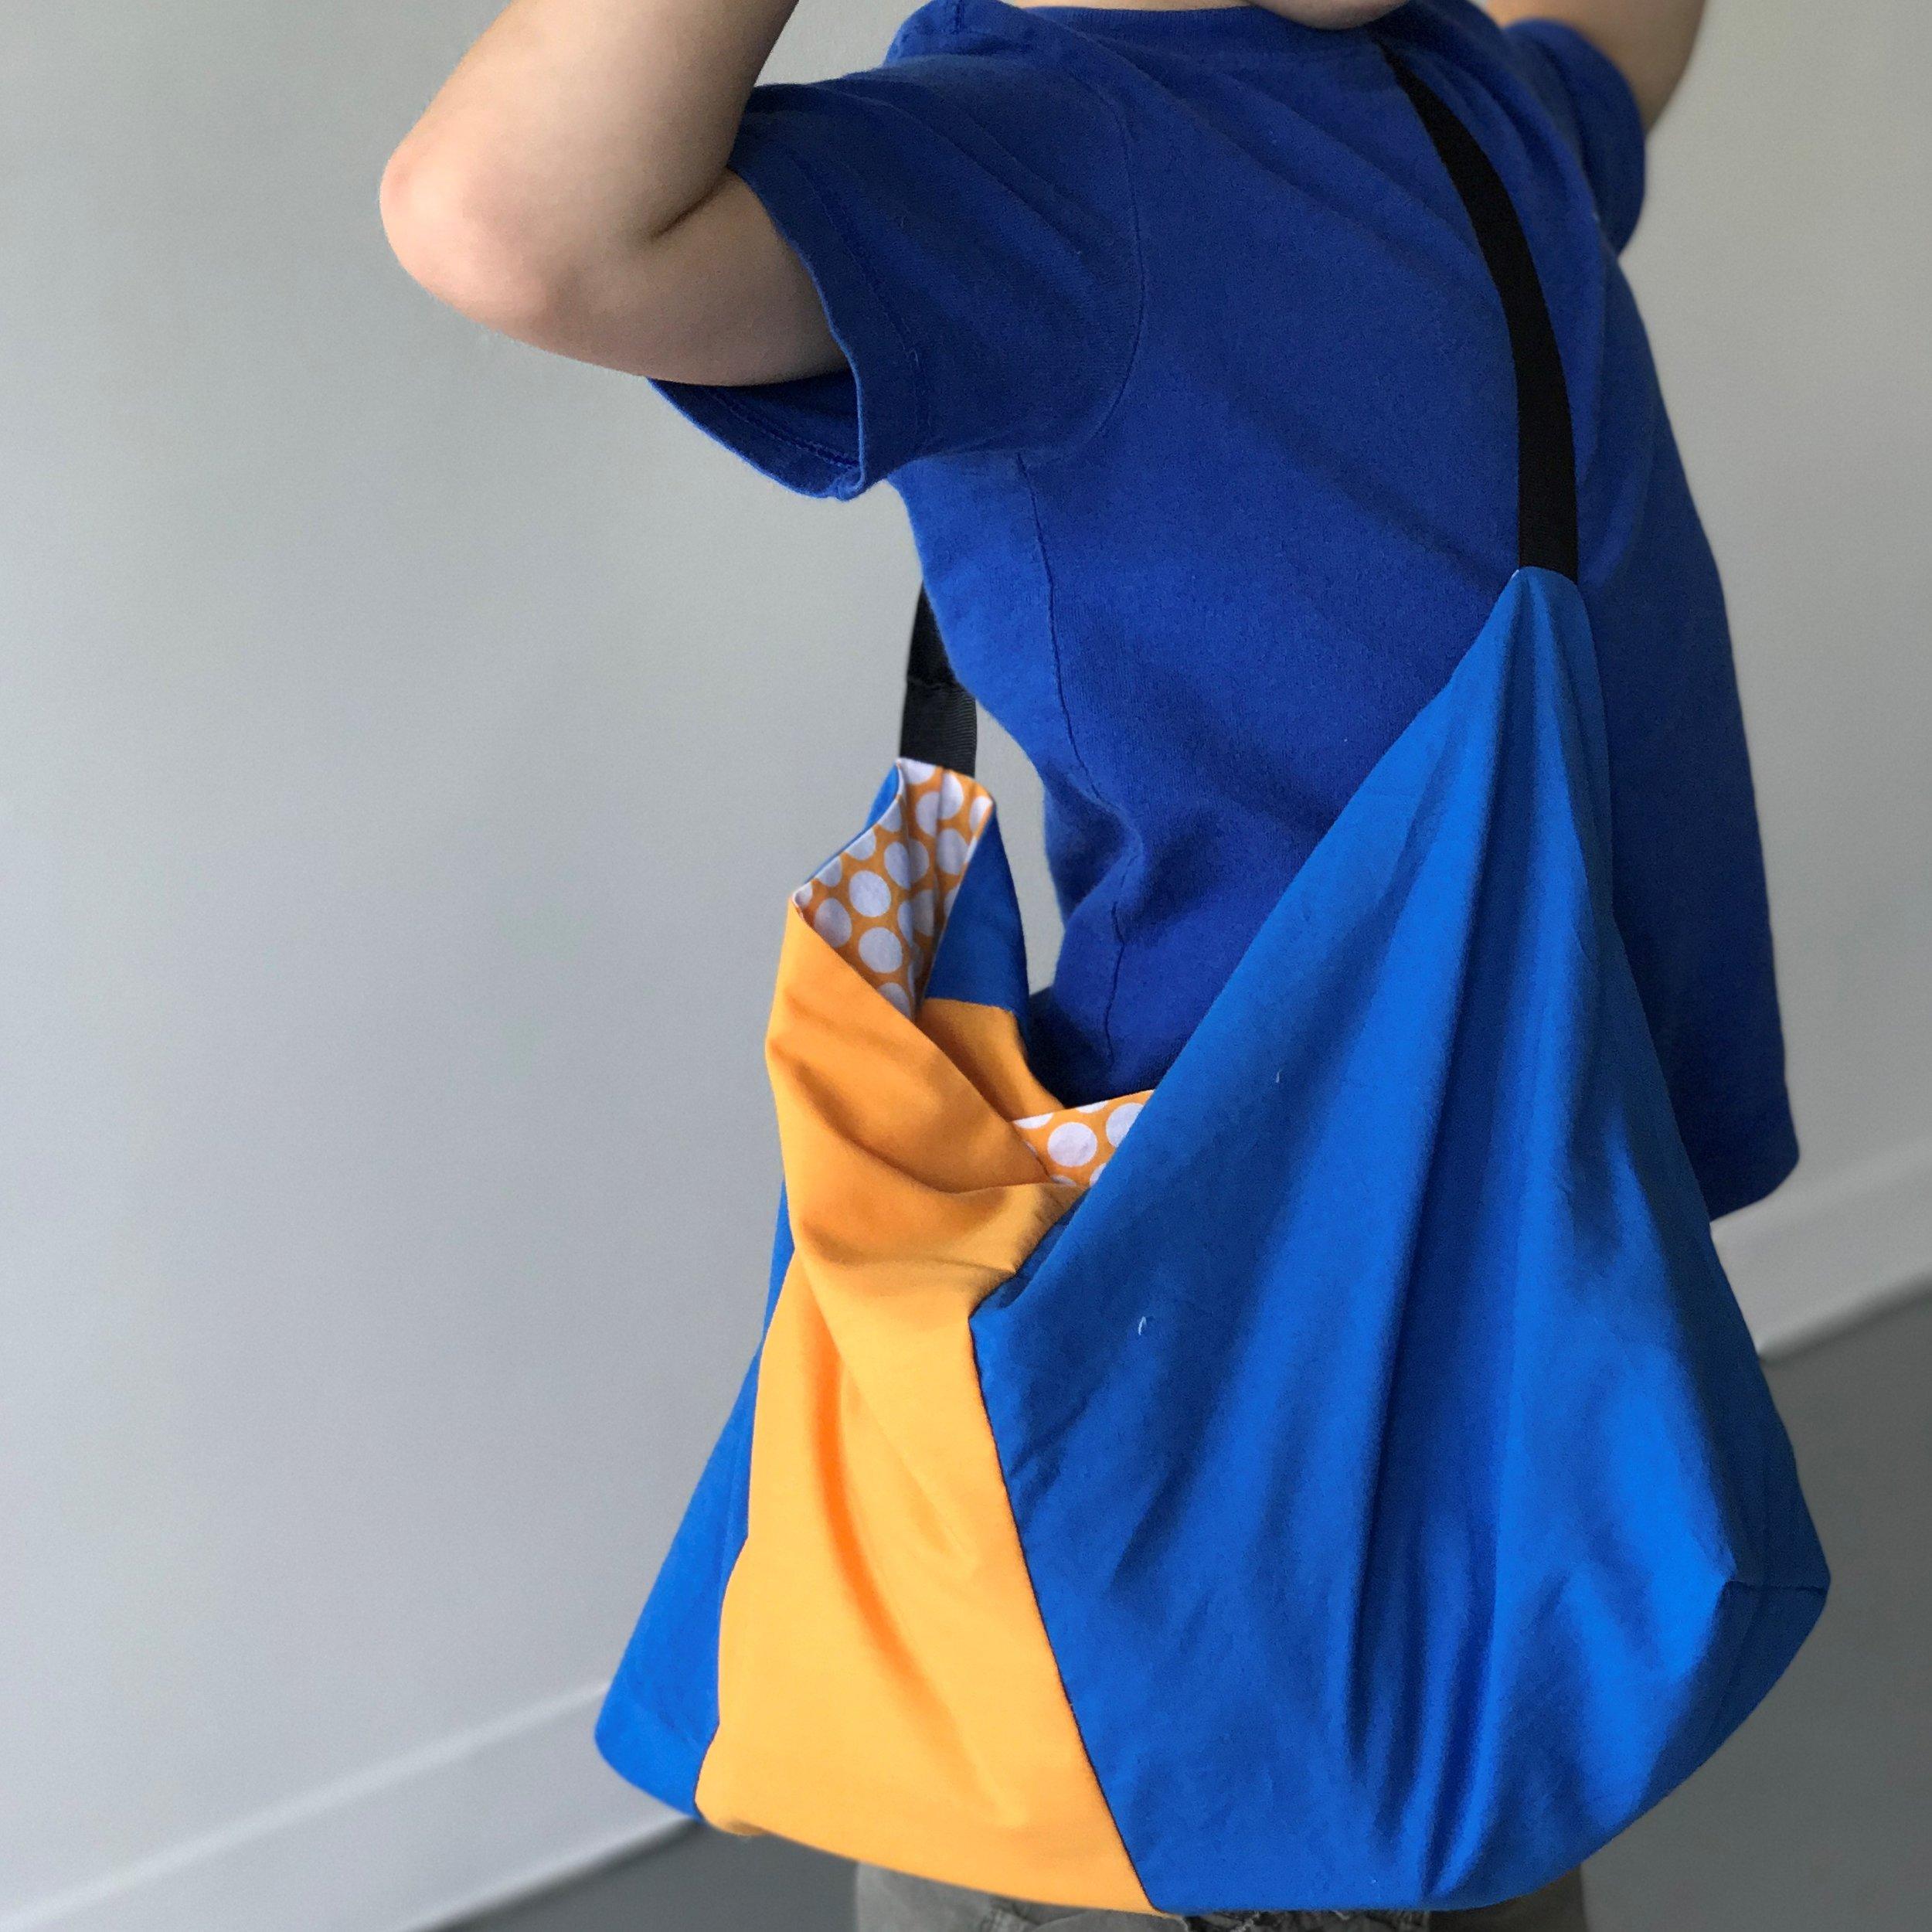 Triumphant boy with his custom bag that goes everywhere.